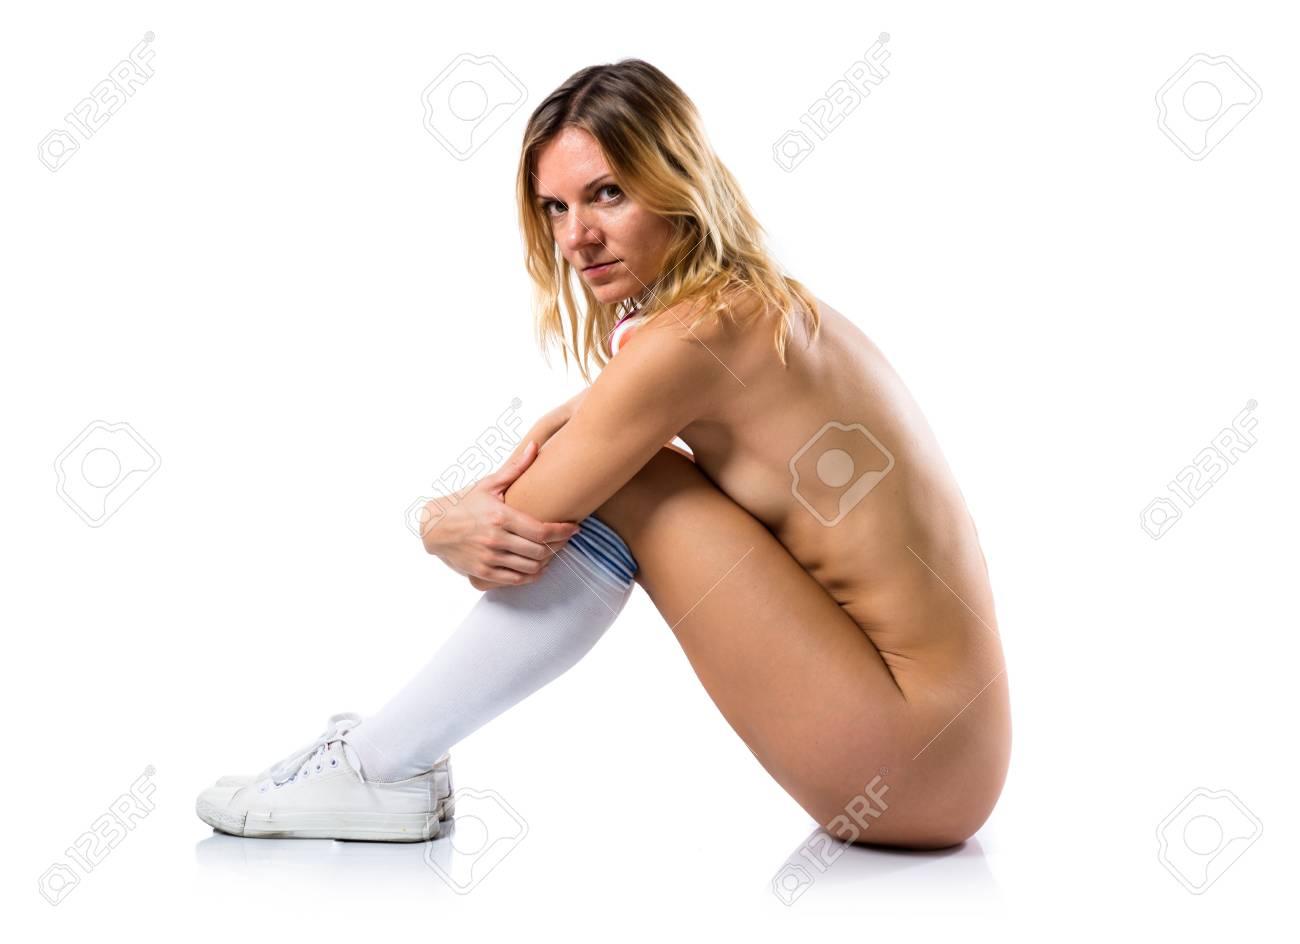 Photos of old woman still a virgin naked